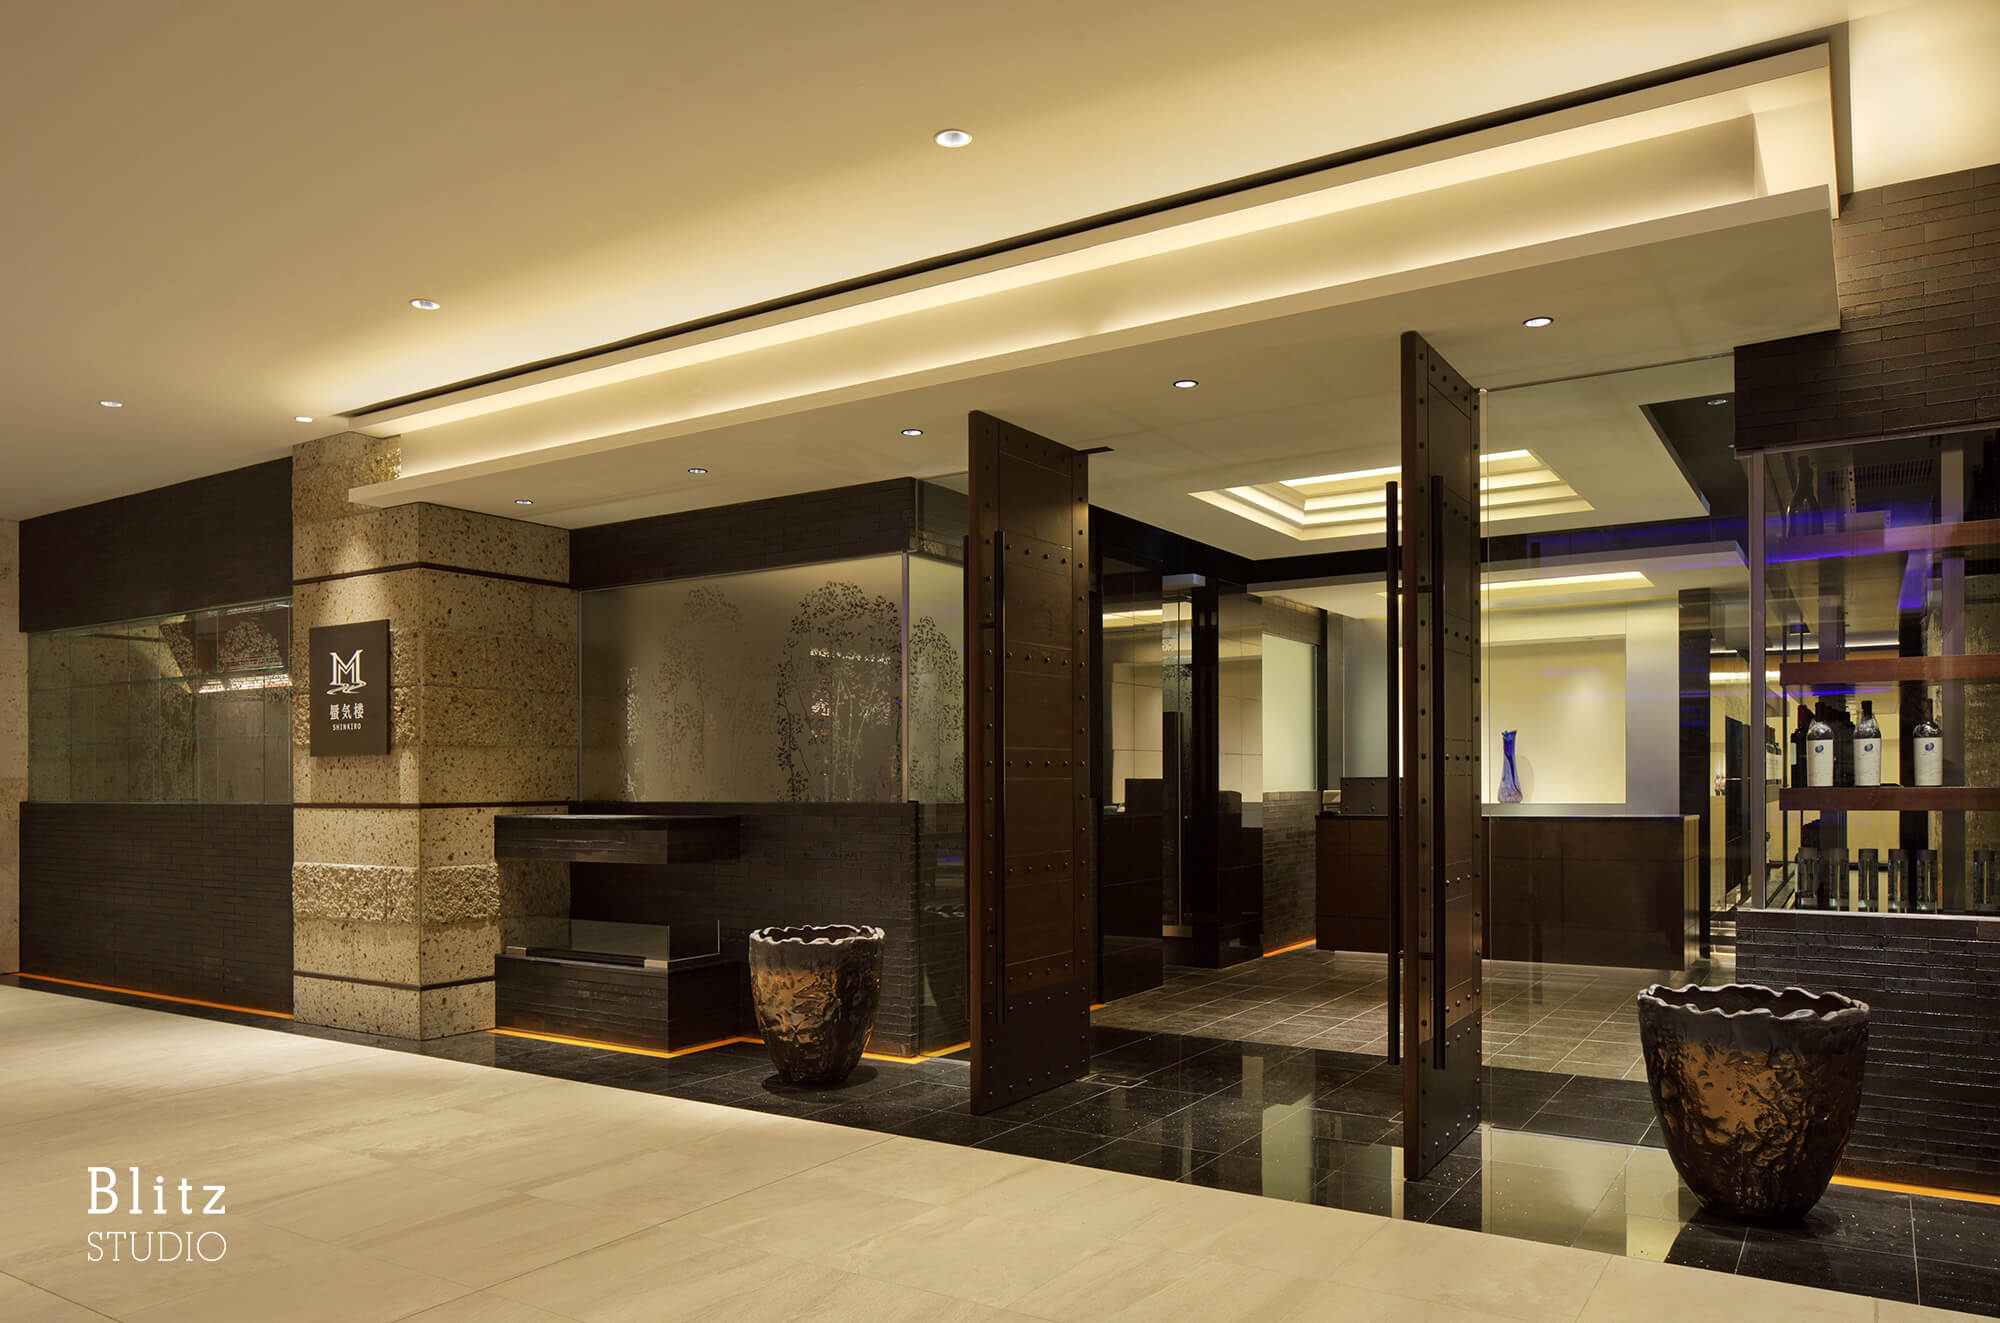 『HOTEL SHIGIRA MIRAGE BAYSIDE』建築写真・竣工写真・インテリア写真13